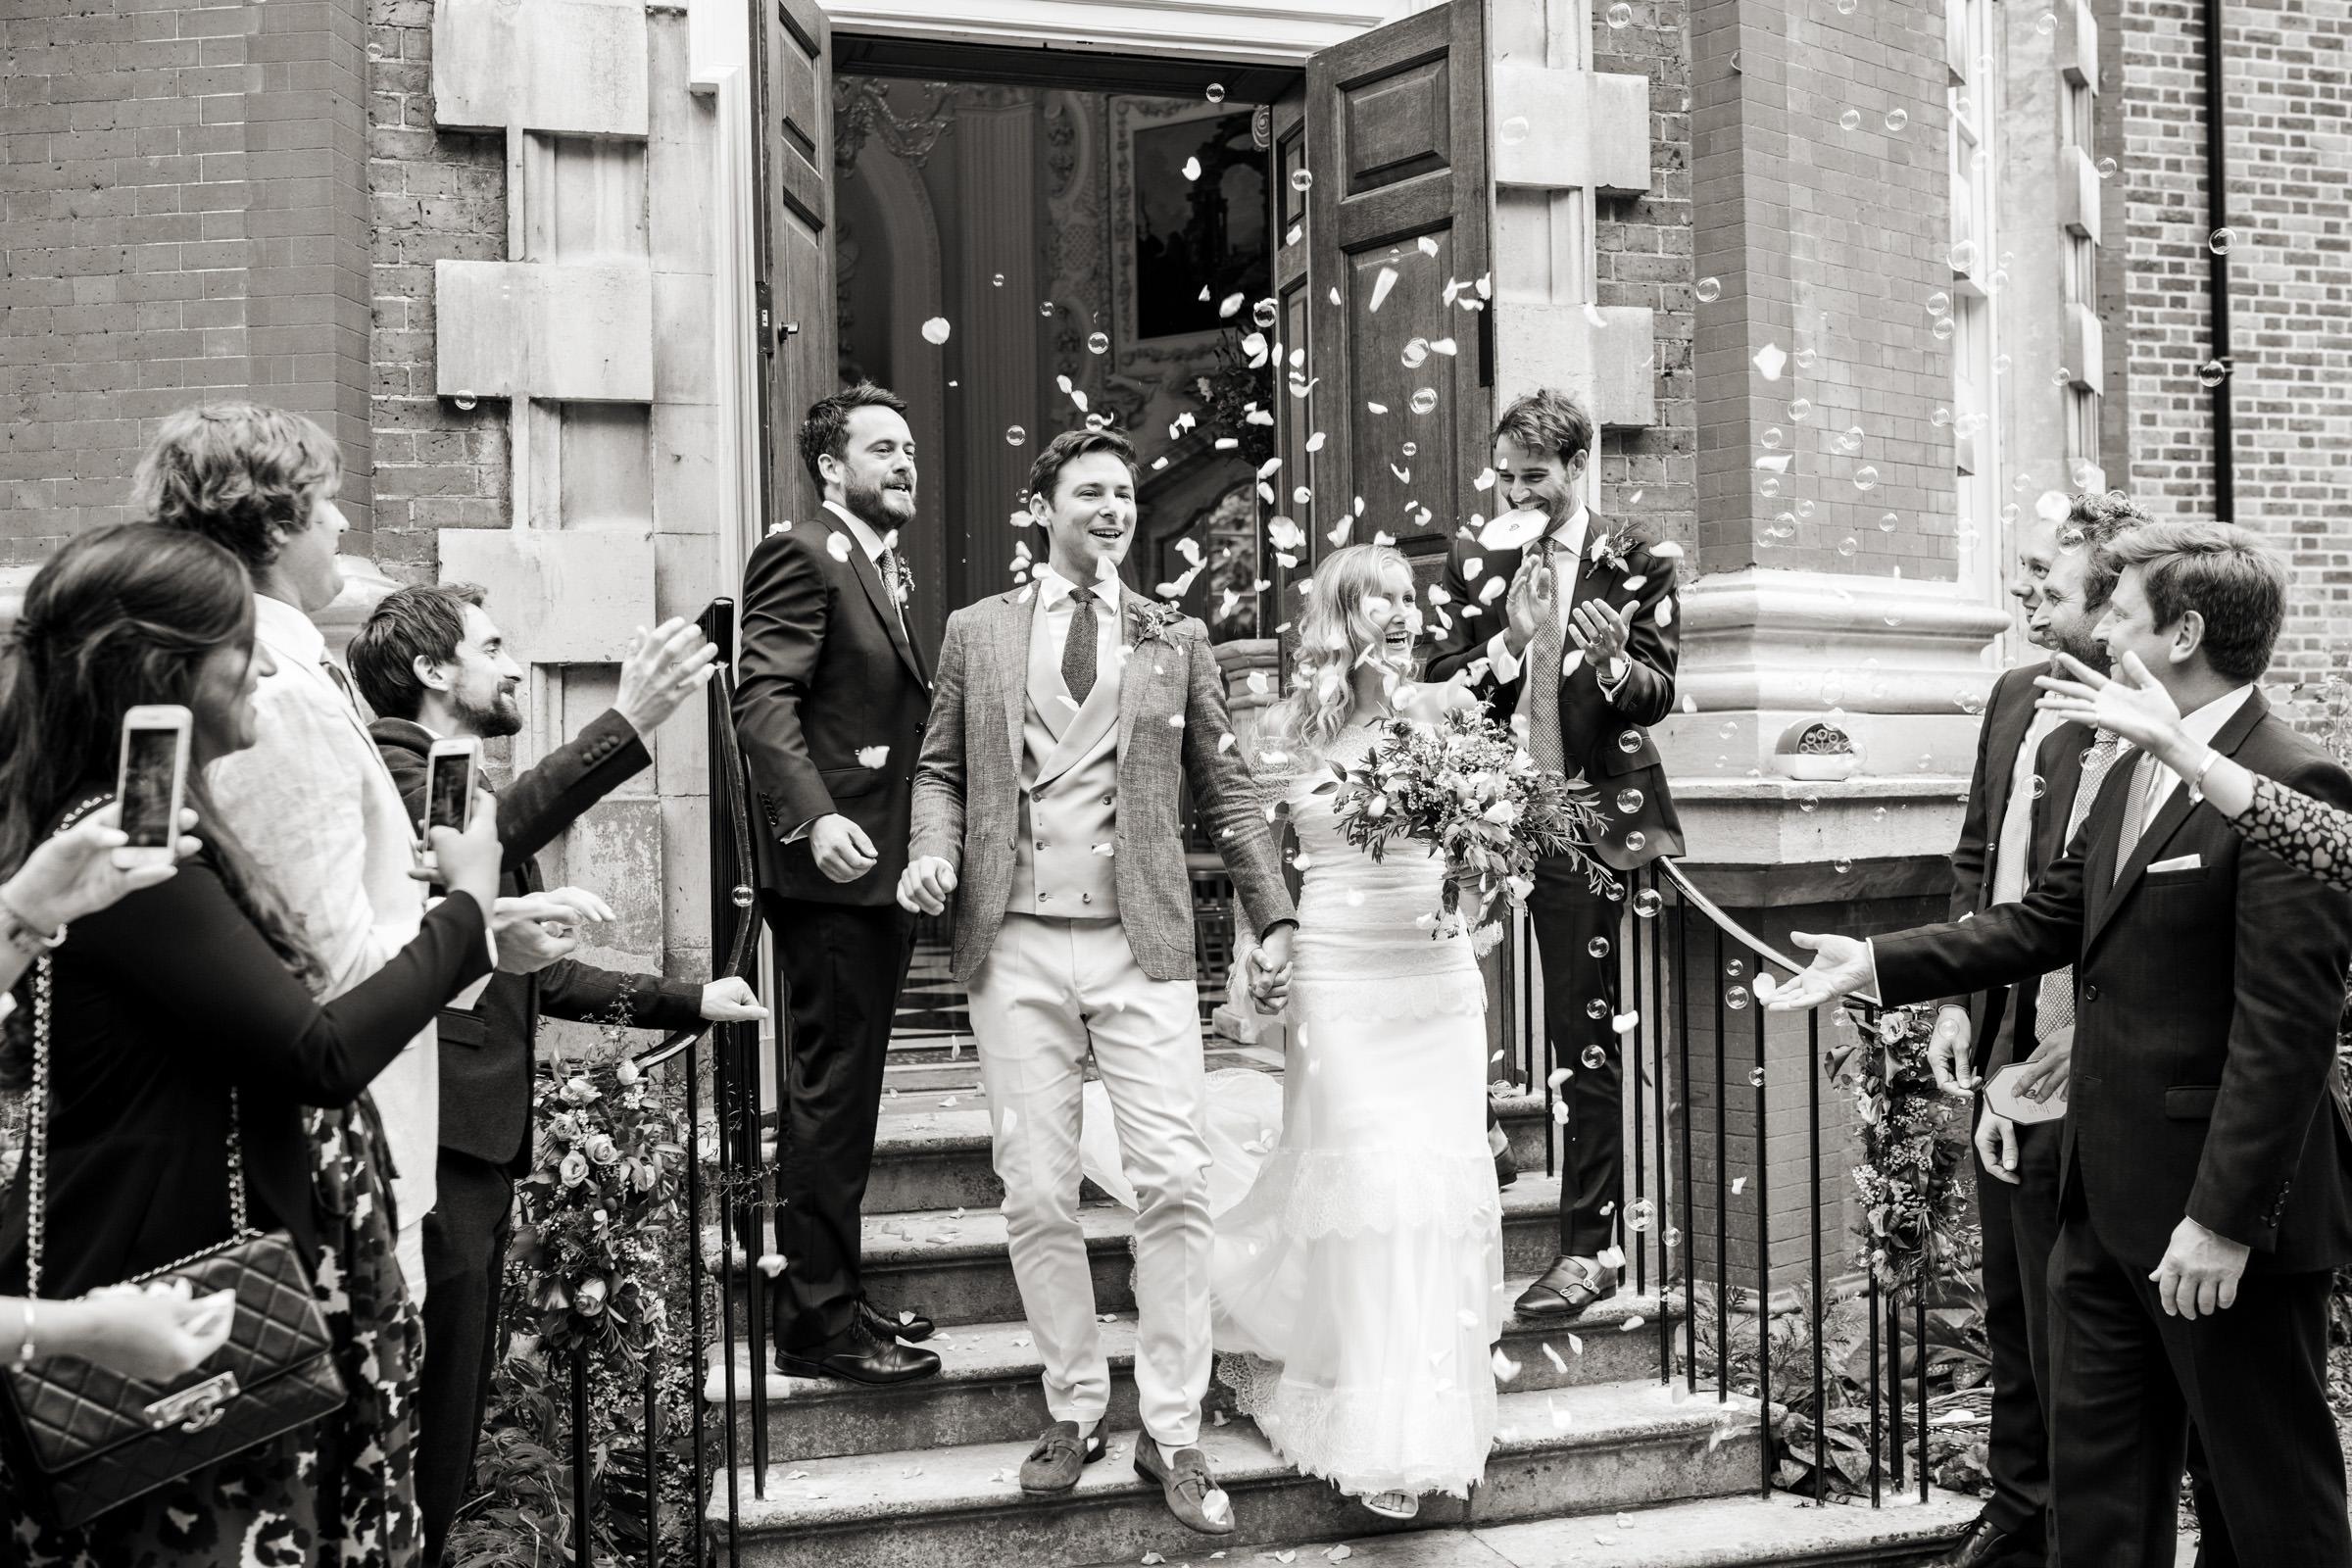 barbican london wedding photography 004.jpg